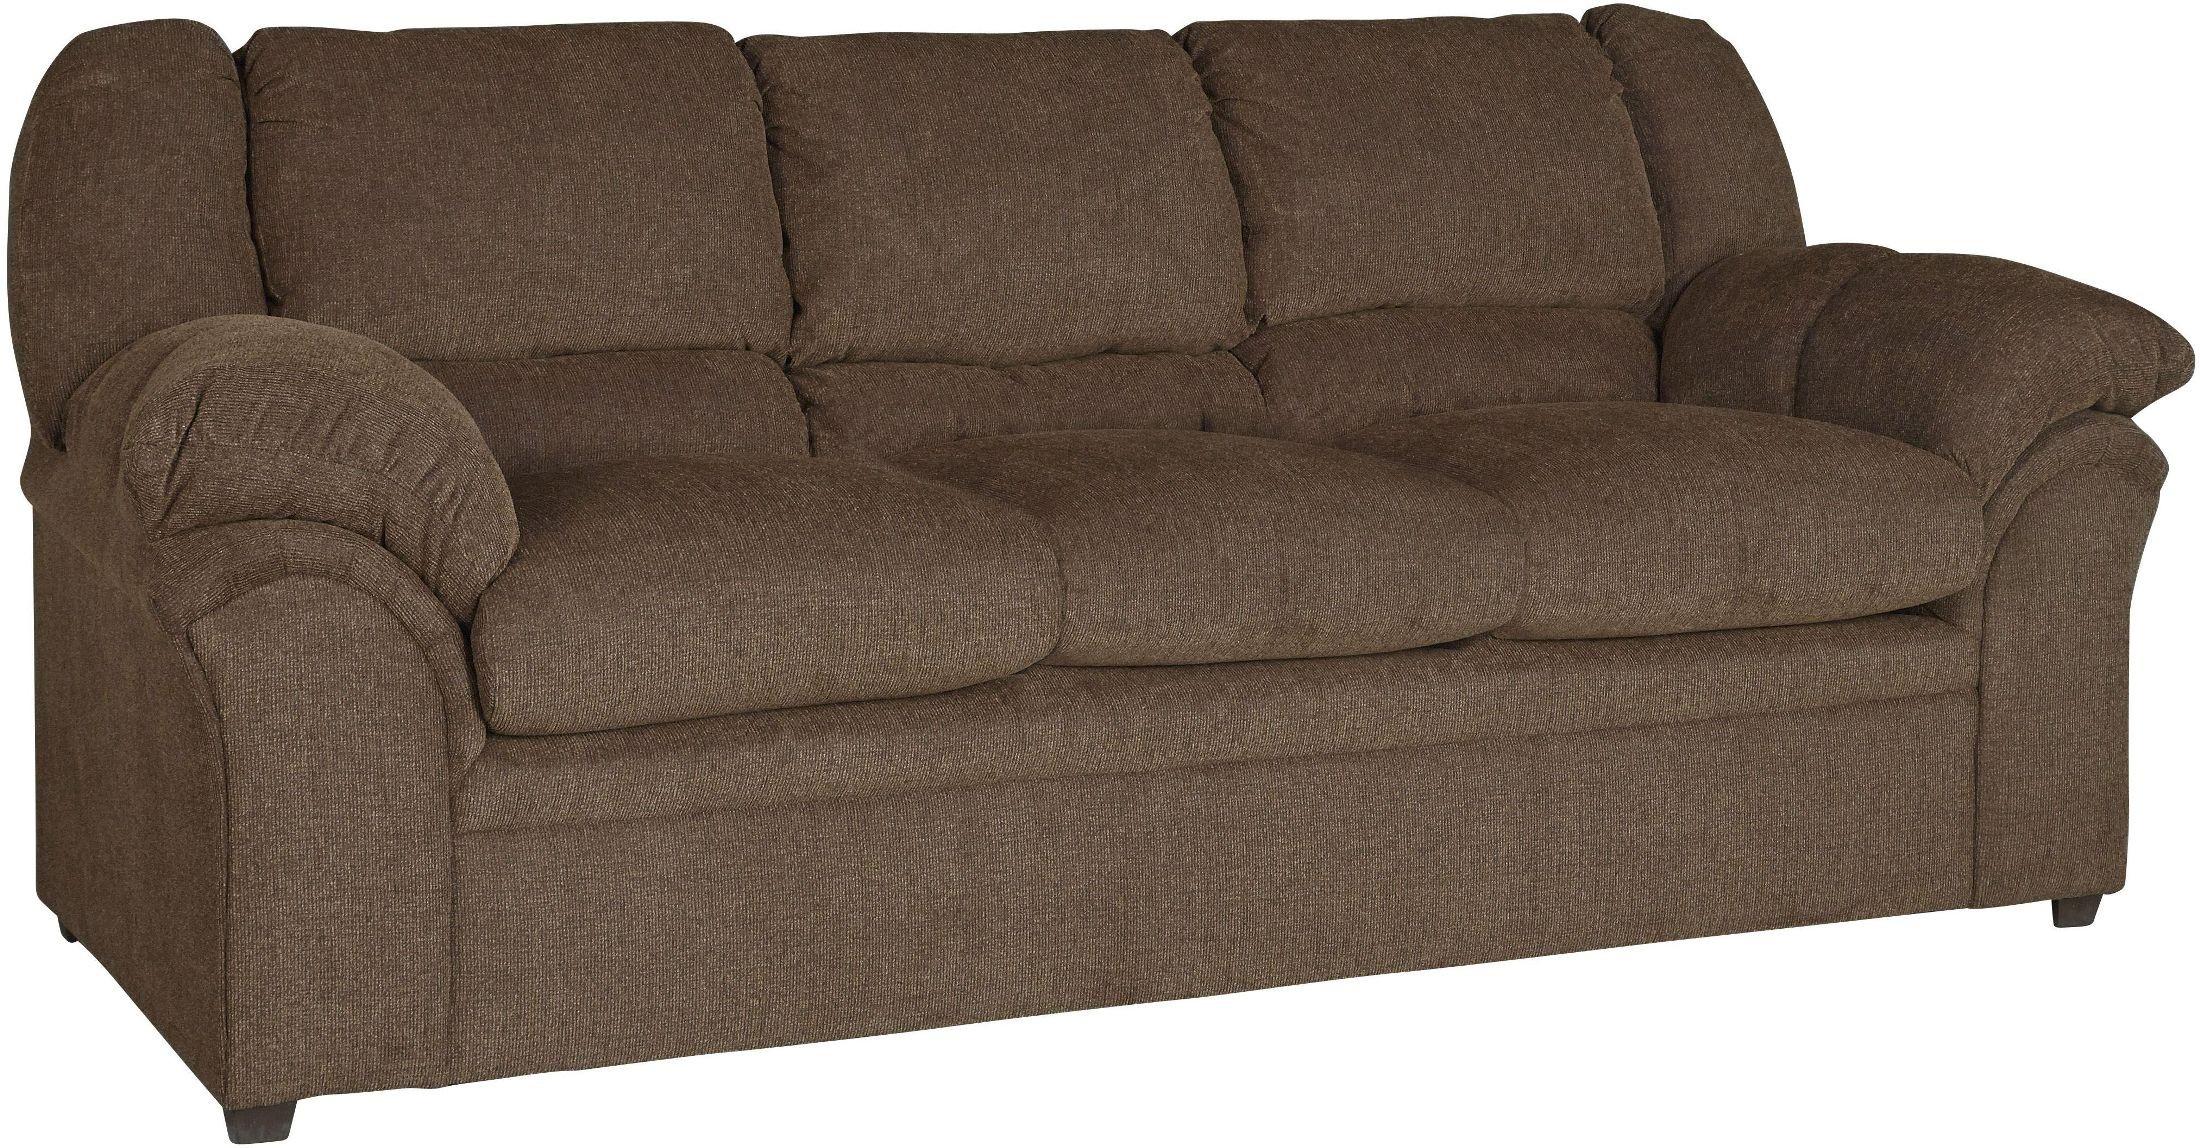 big ben chocolate sofa from progressive furniture coleman furniture. Black Bedroom Furniture Sets. Home Design Ideas